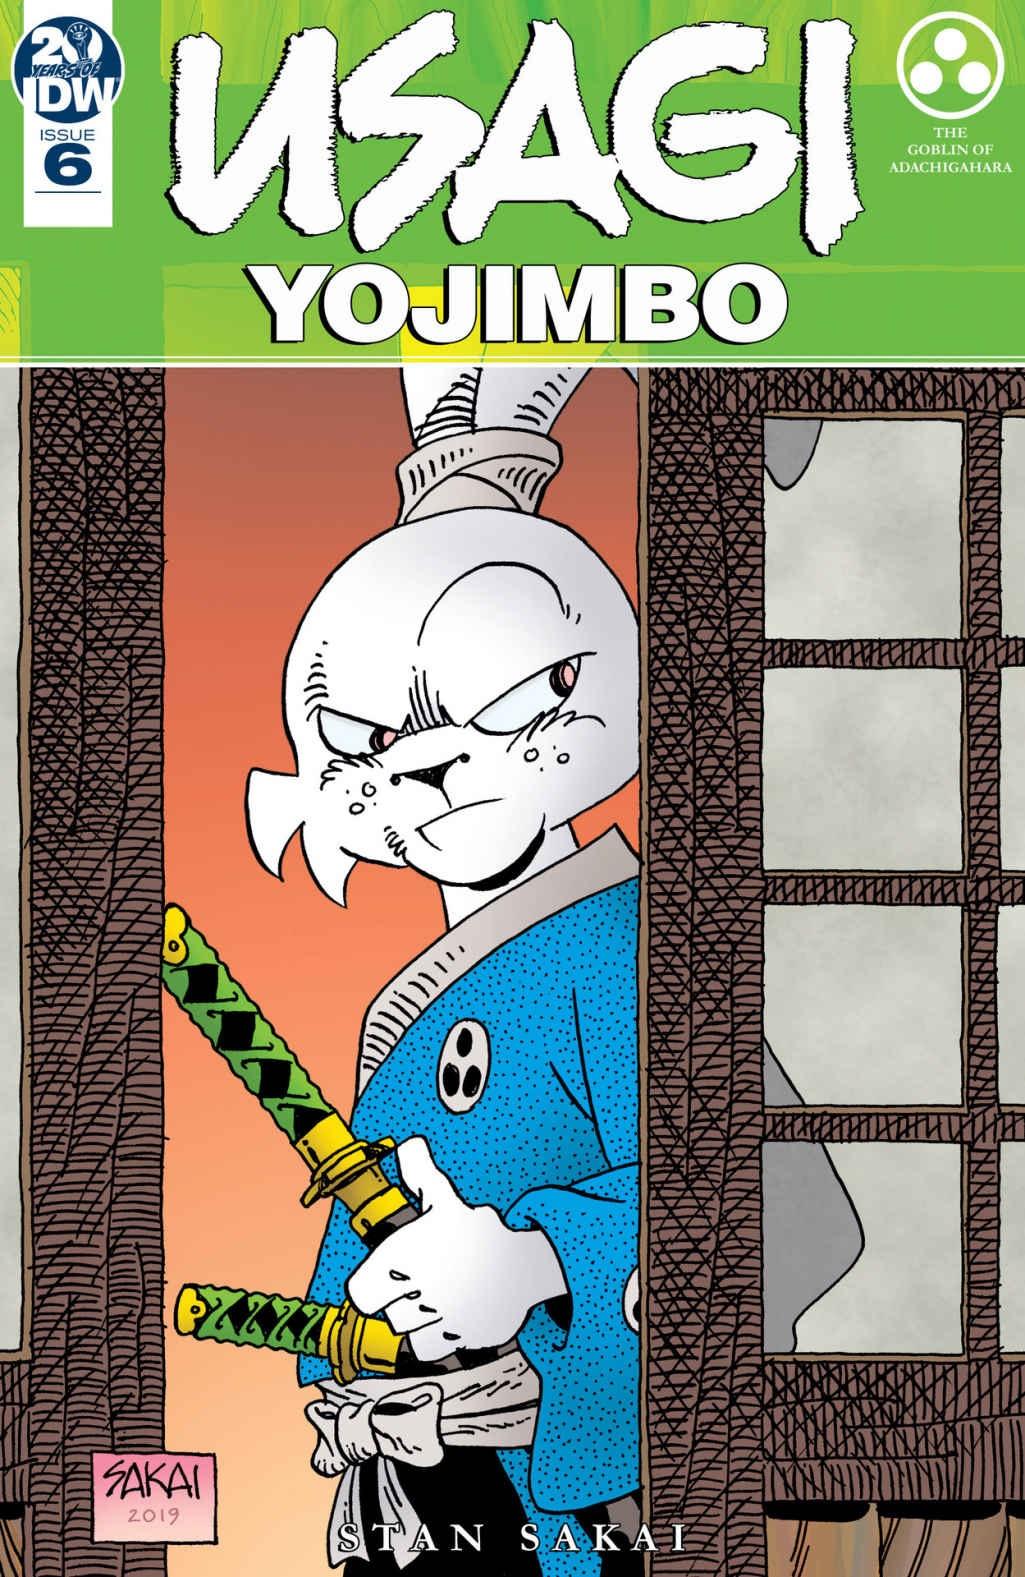 Best Comics of 2019: Usagi Yojimbo